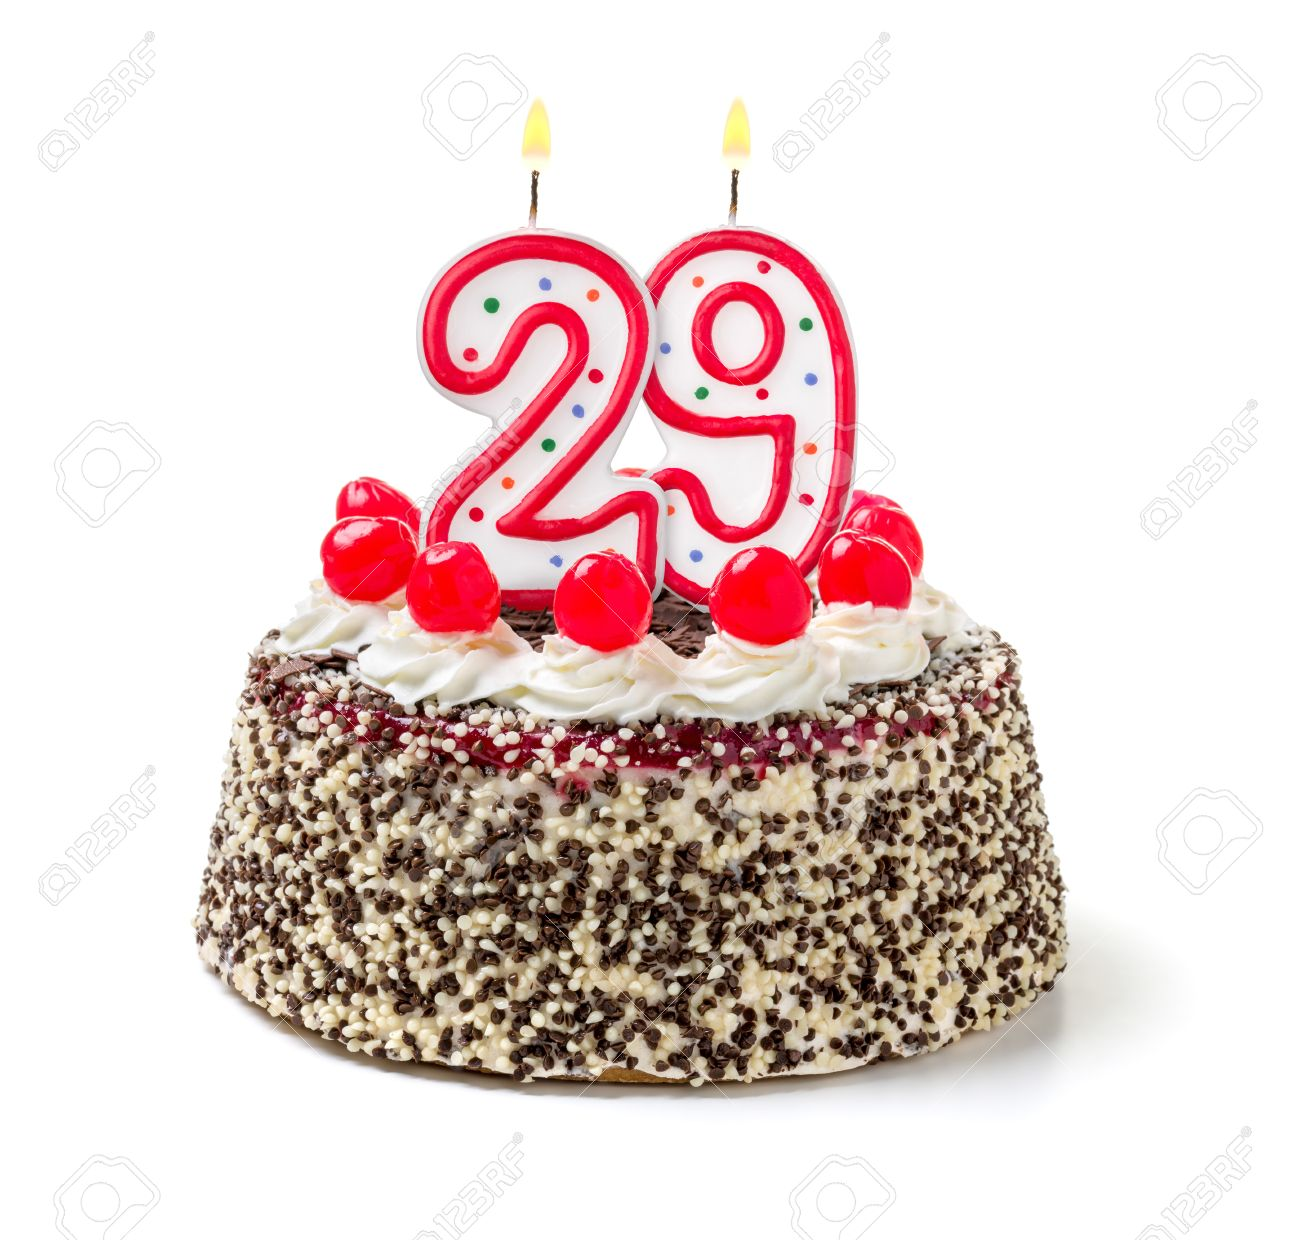 Astonishing Birthday Cake Pict Image Collections Birthday Cake Decoration Birthday Cards Printable Trancafe Filternl